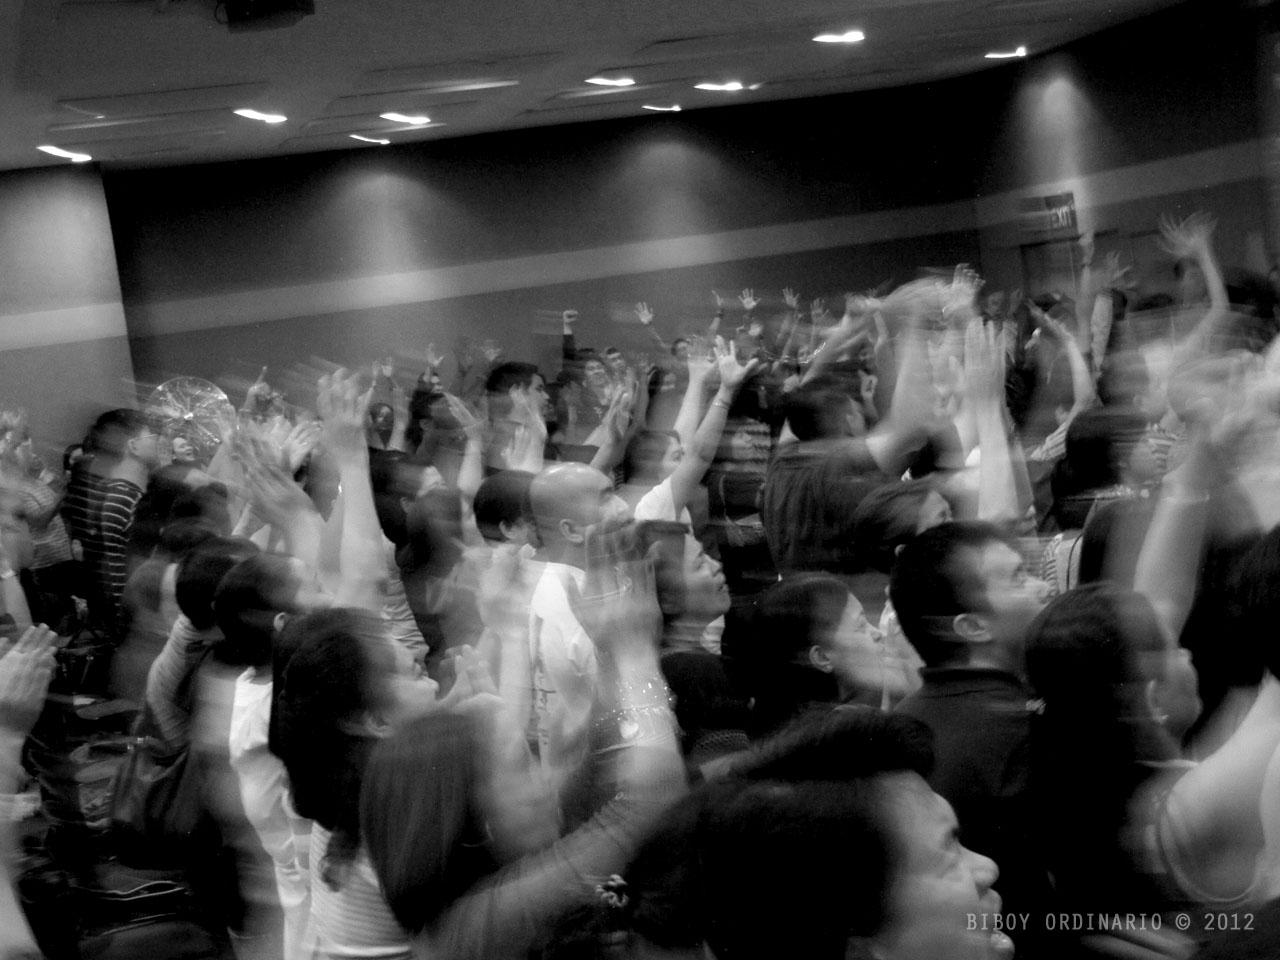 Praise and worship, victory metroeast